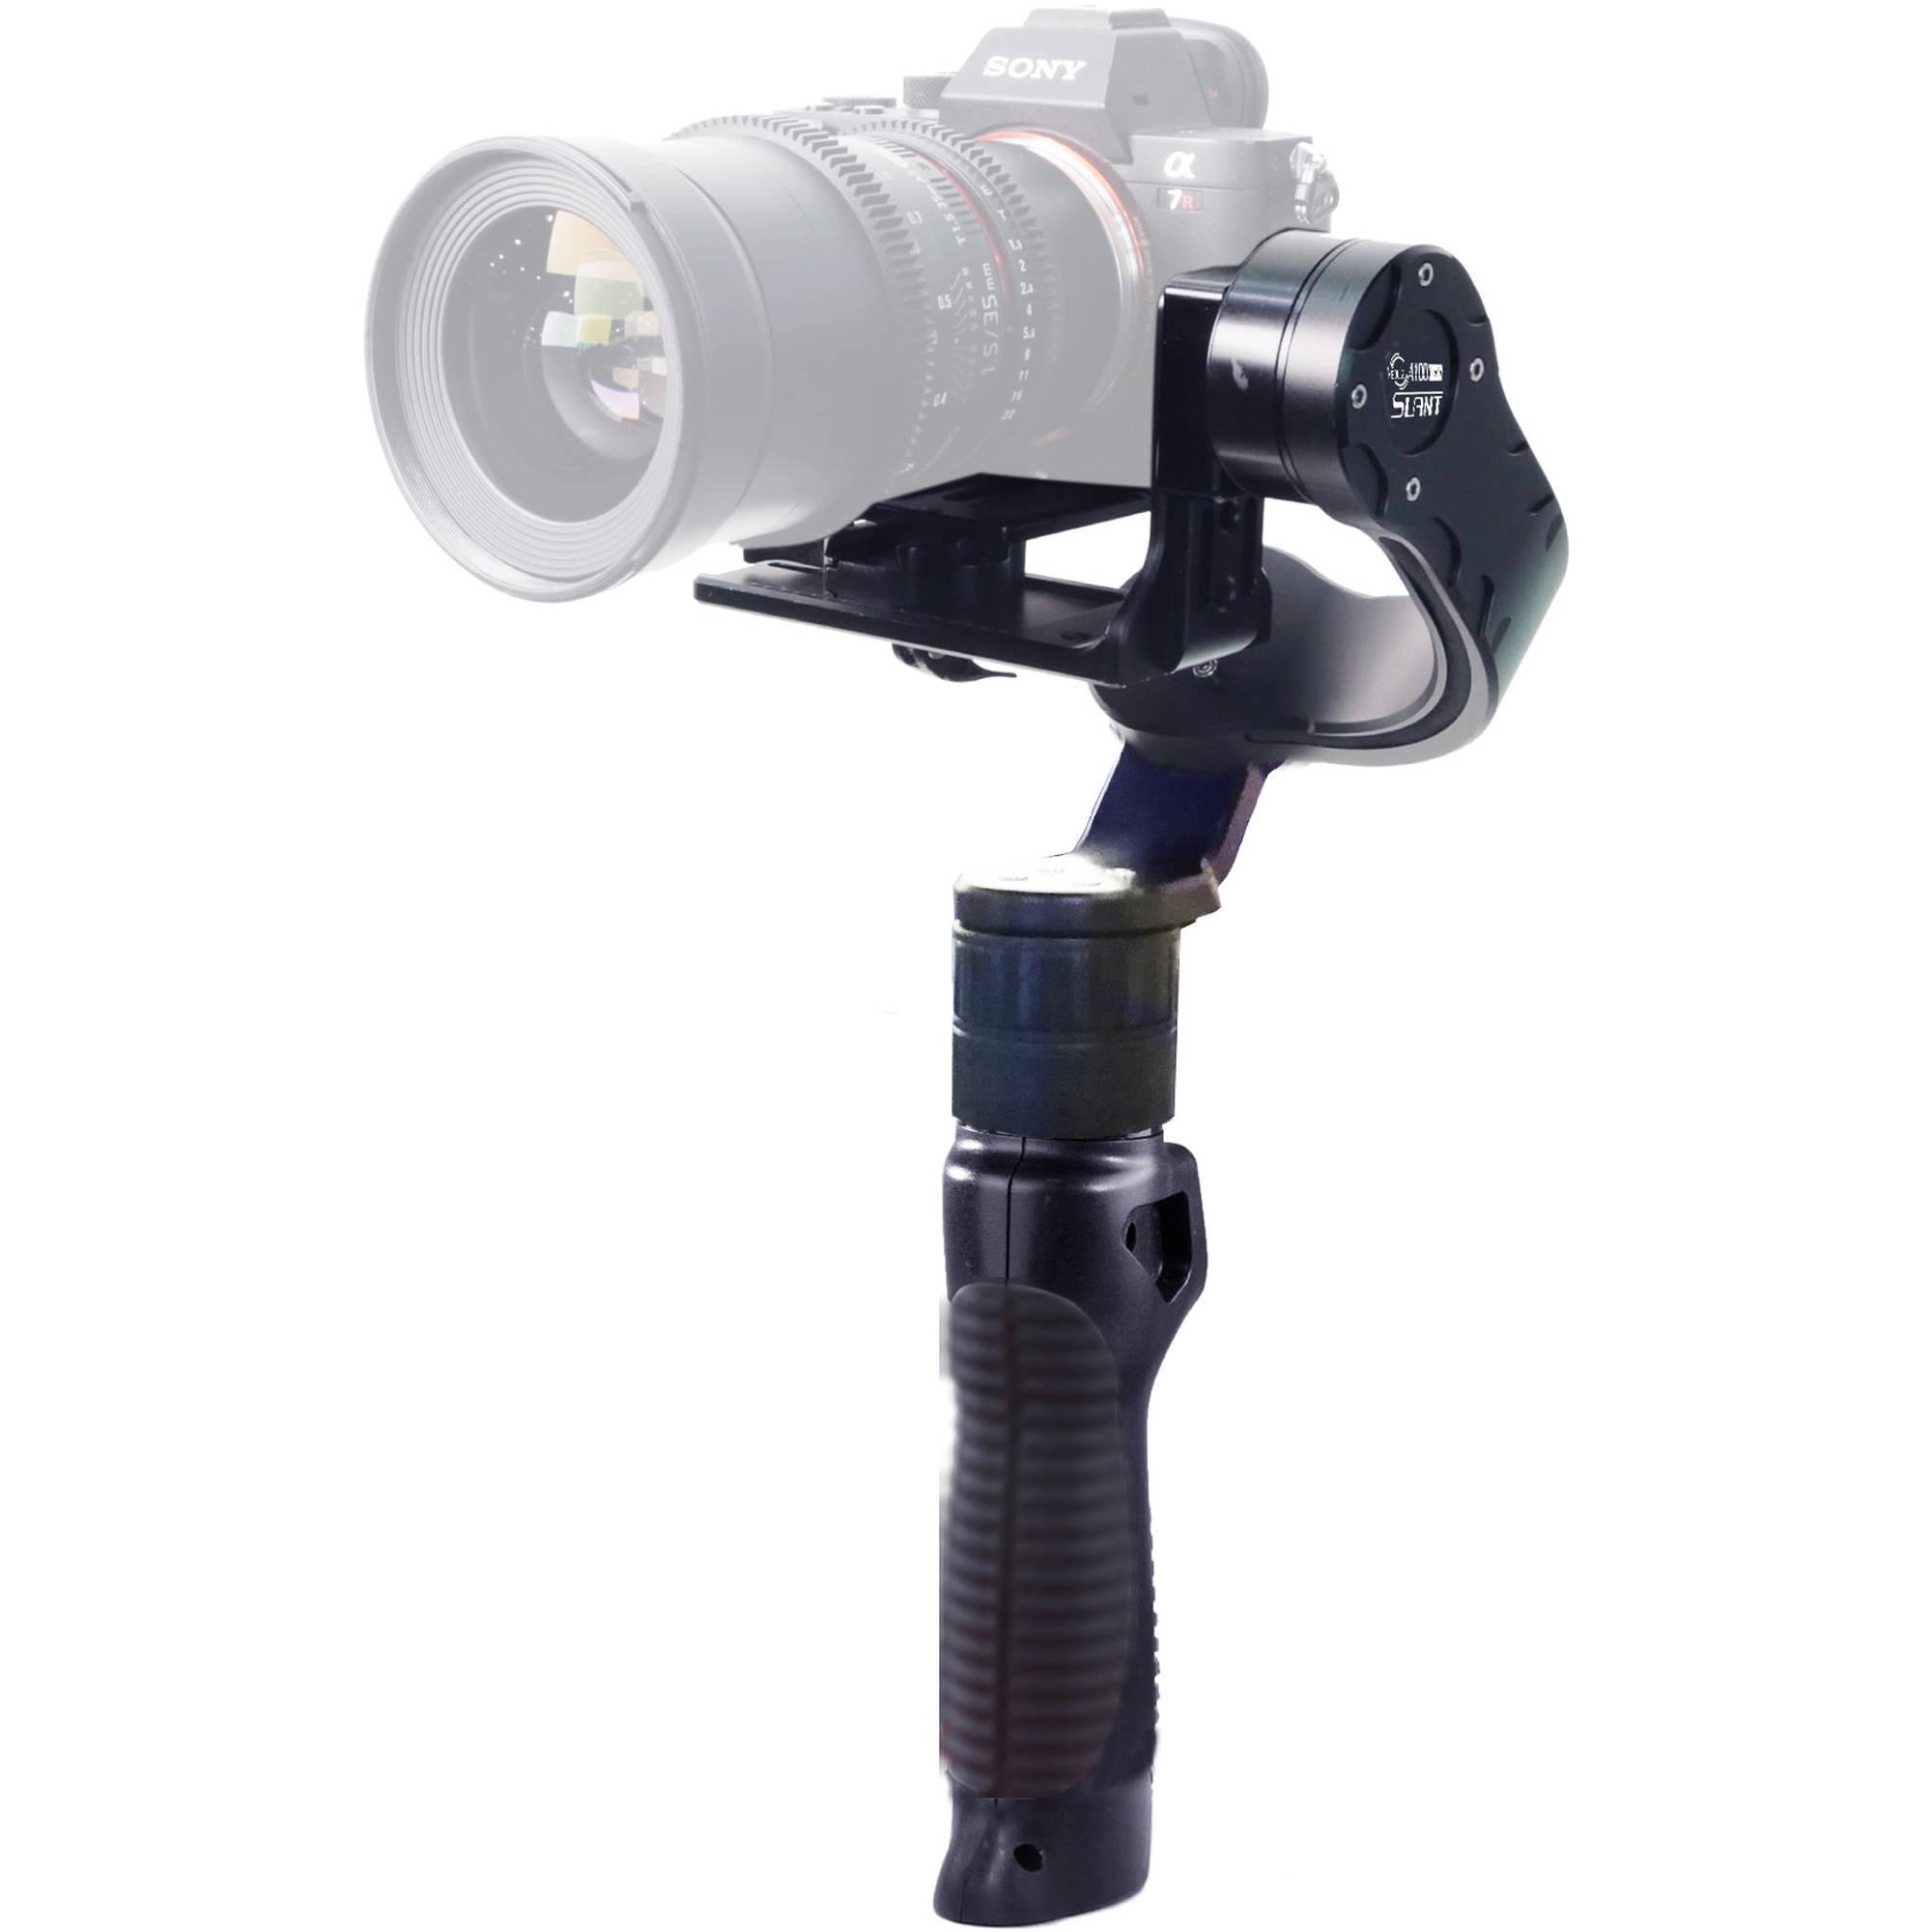 115eeb5410 Nebula 4100 Slant 3-Axis Single Handheld Gimbal FPNE4100S B&H